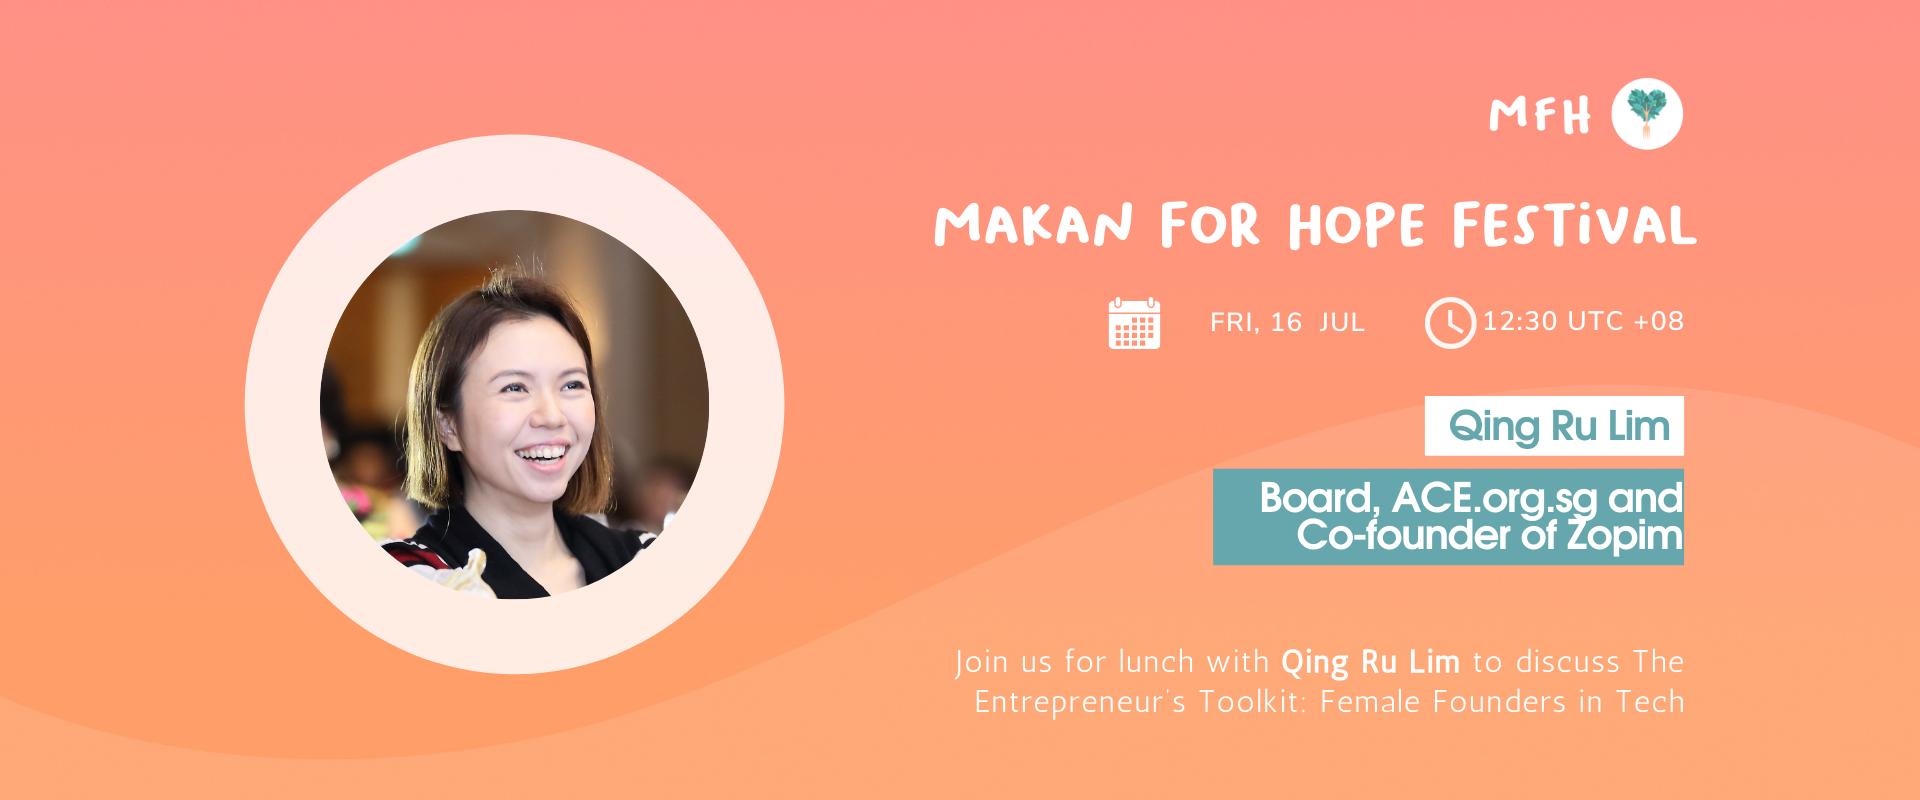 Qing Ru Lim - The Entrepreneur's Toolkit: Female Founders in Tech